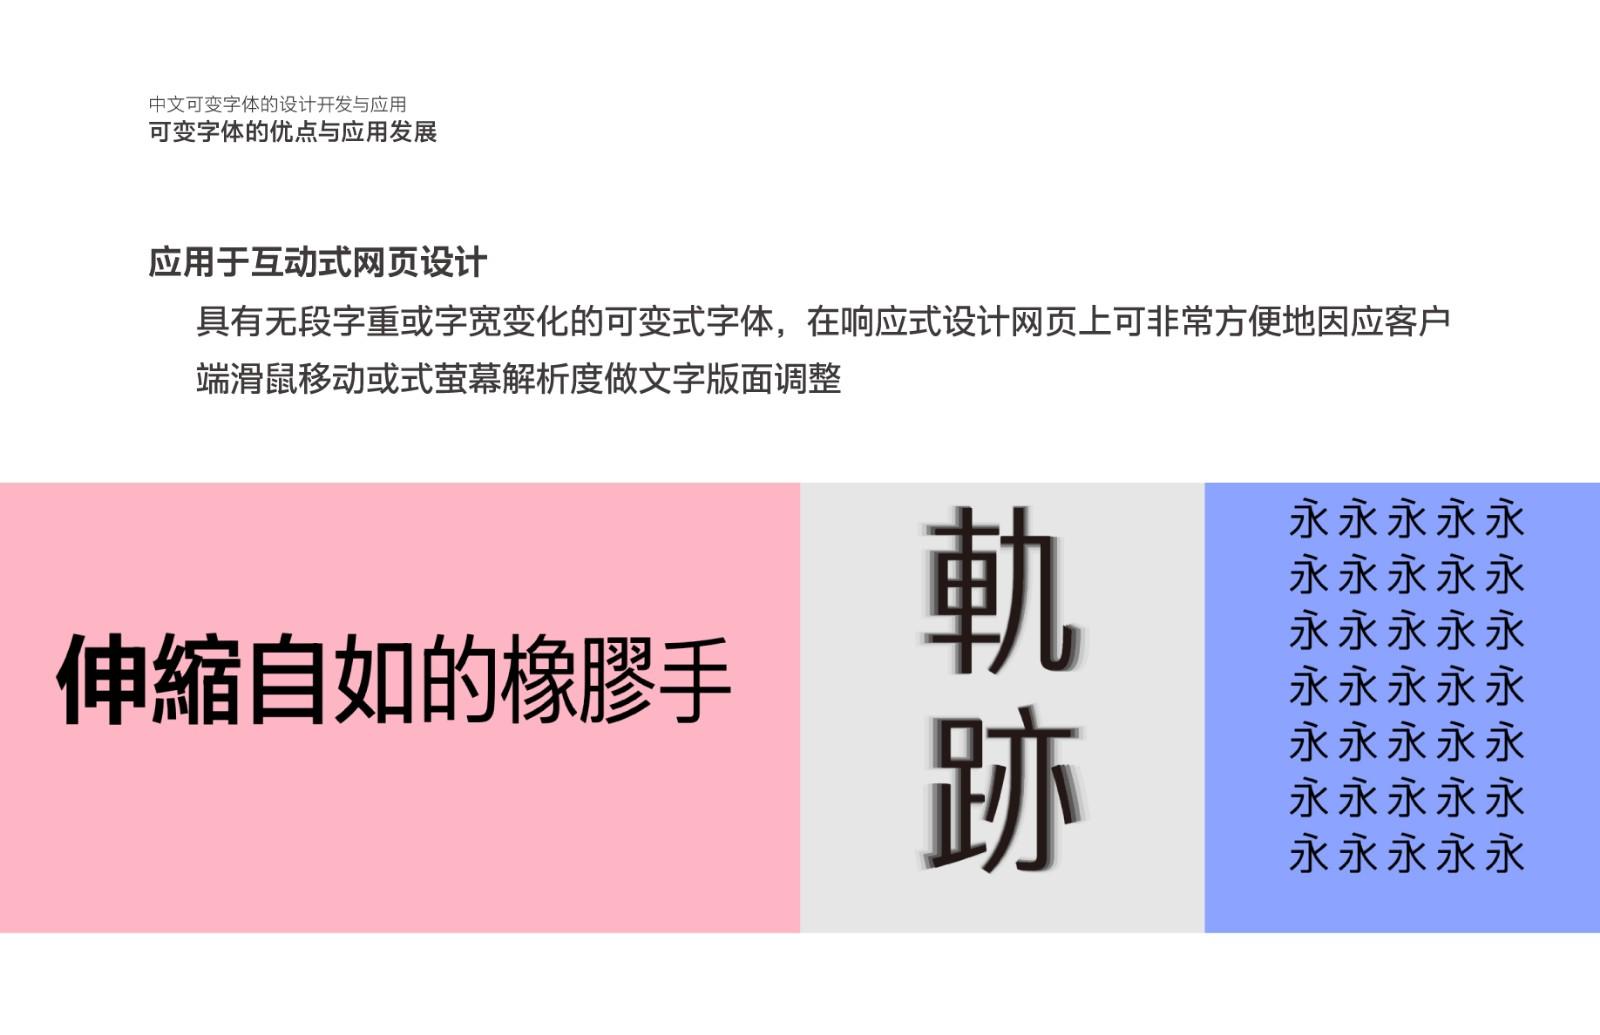 https://ft-bk1.oss-cn-zhangjiakou.aliyuncs.com/Public/Uploads/img/n_content_20201210110412_7588.jpg